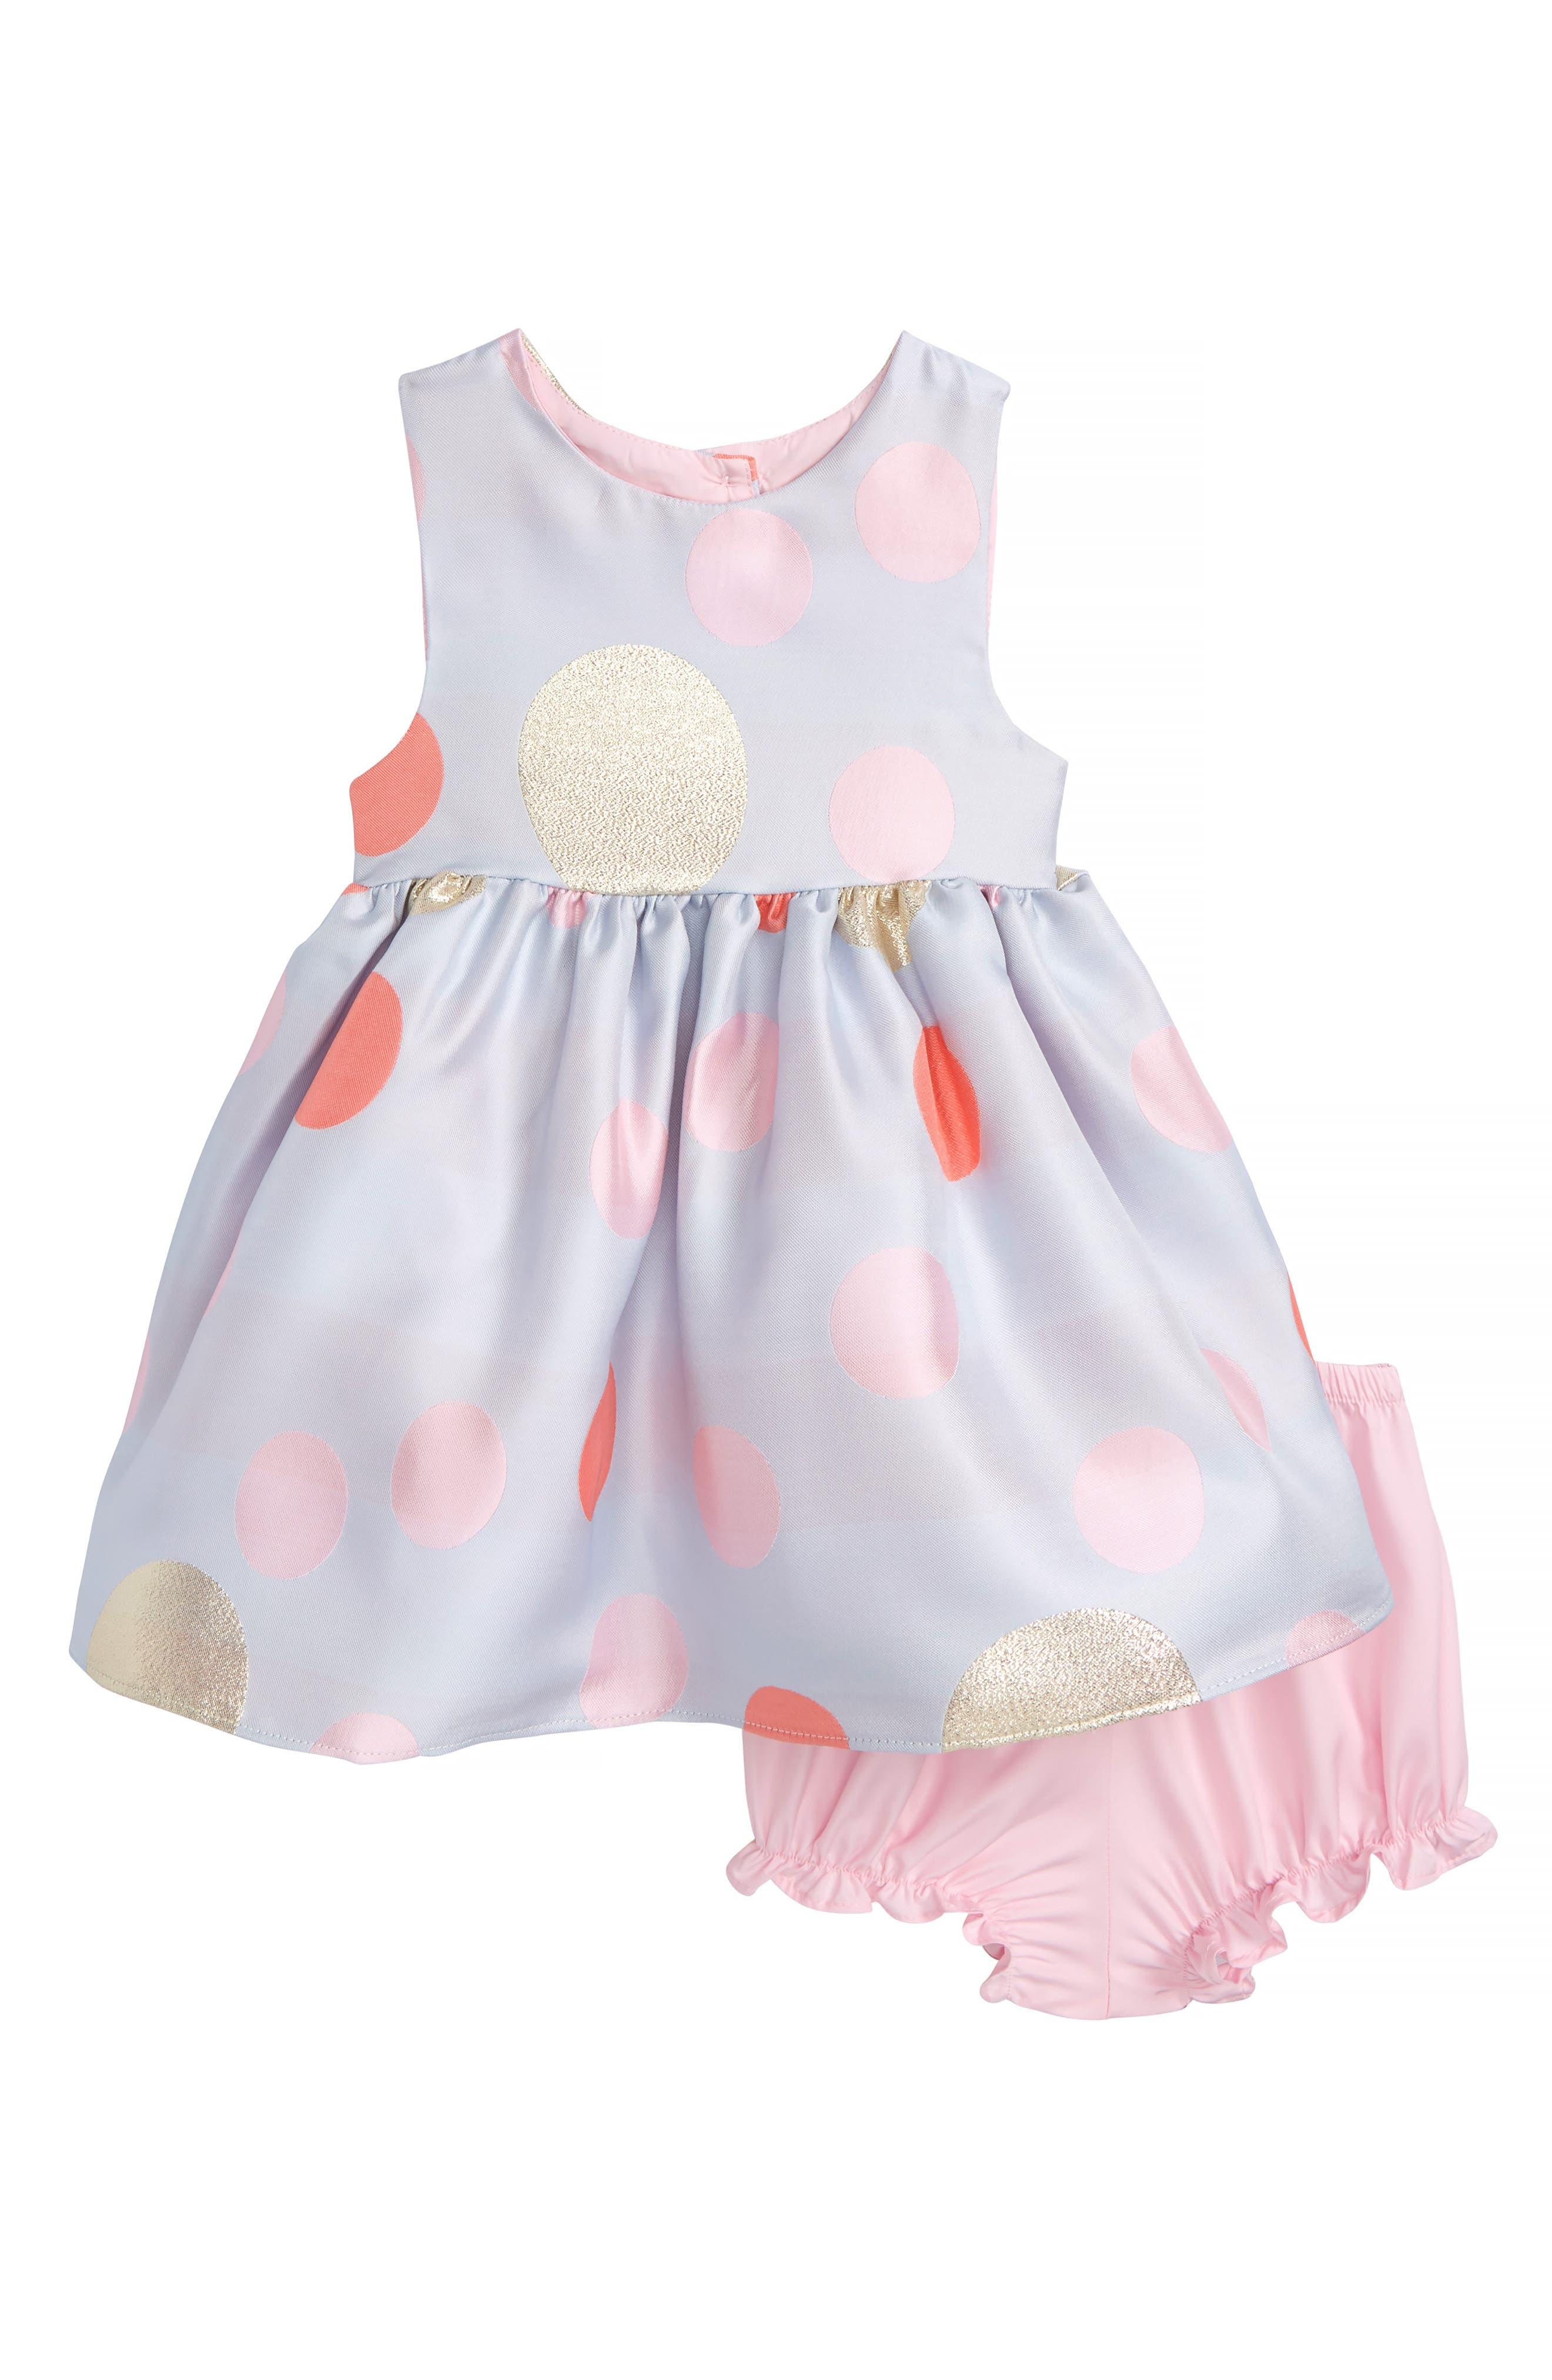 Frais Metallic Jacquard Polka Dot Party Dress (Baby Girls)